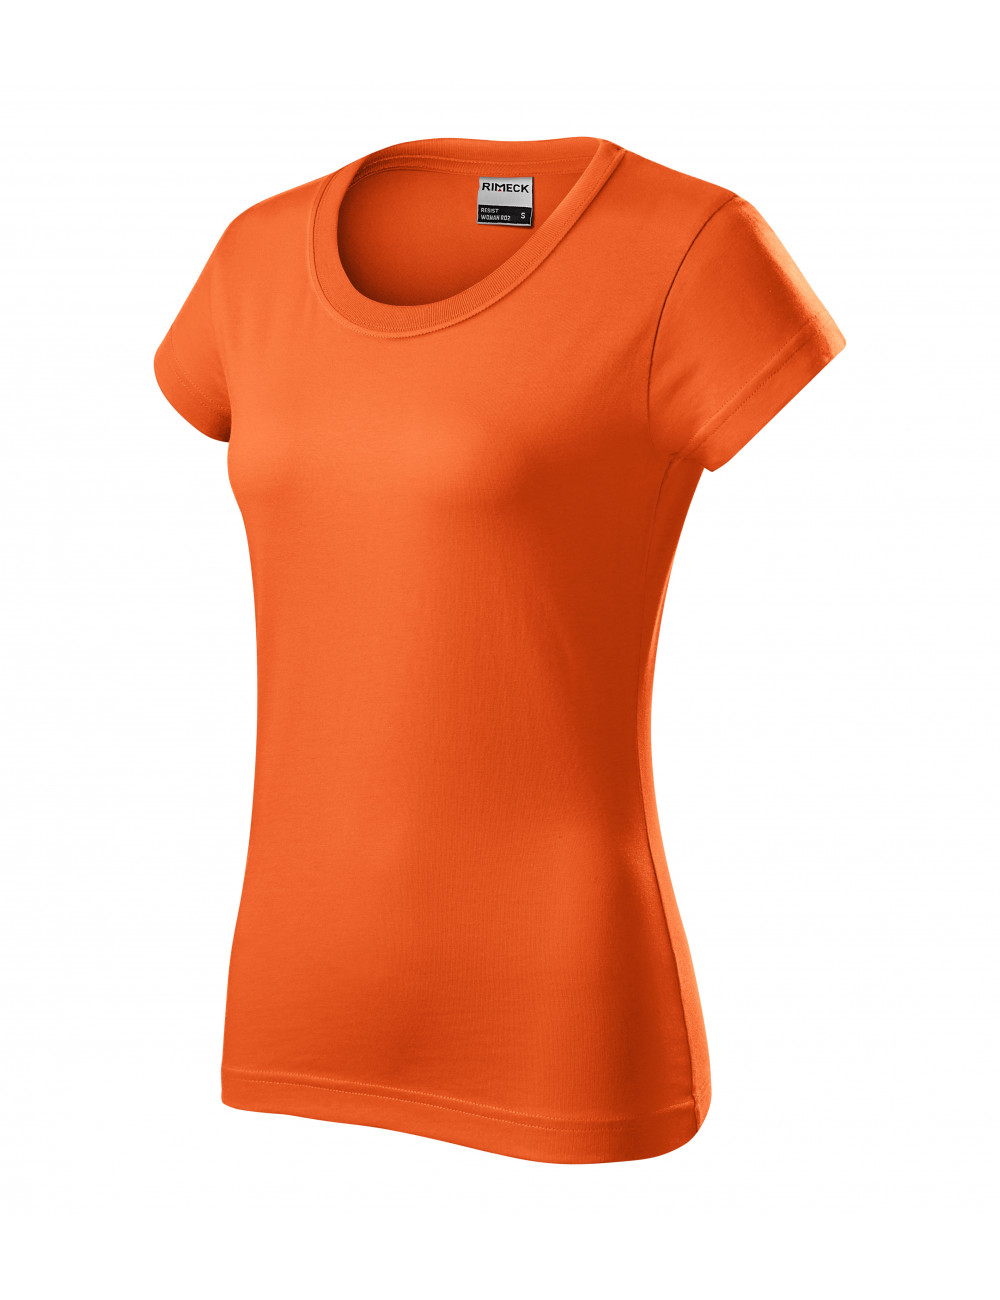 Adler RIMECK Koszulka damska Resist heavy R04 pomarańczowy